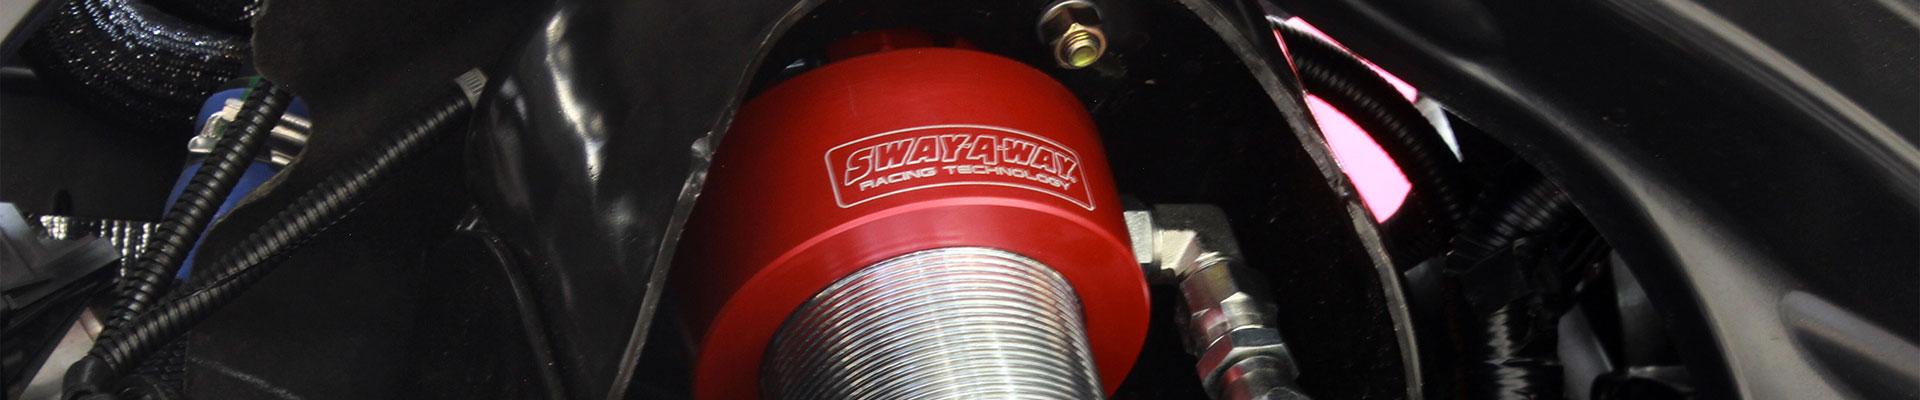 Swayaway Suspenion Raptor install